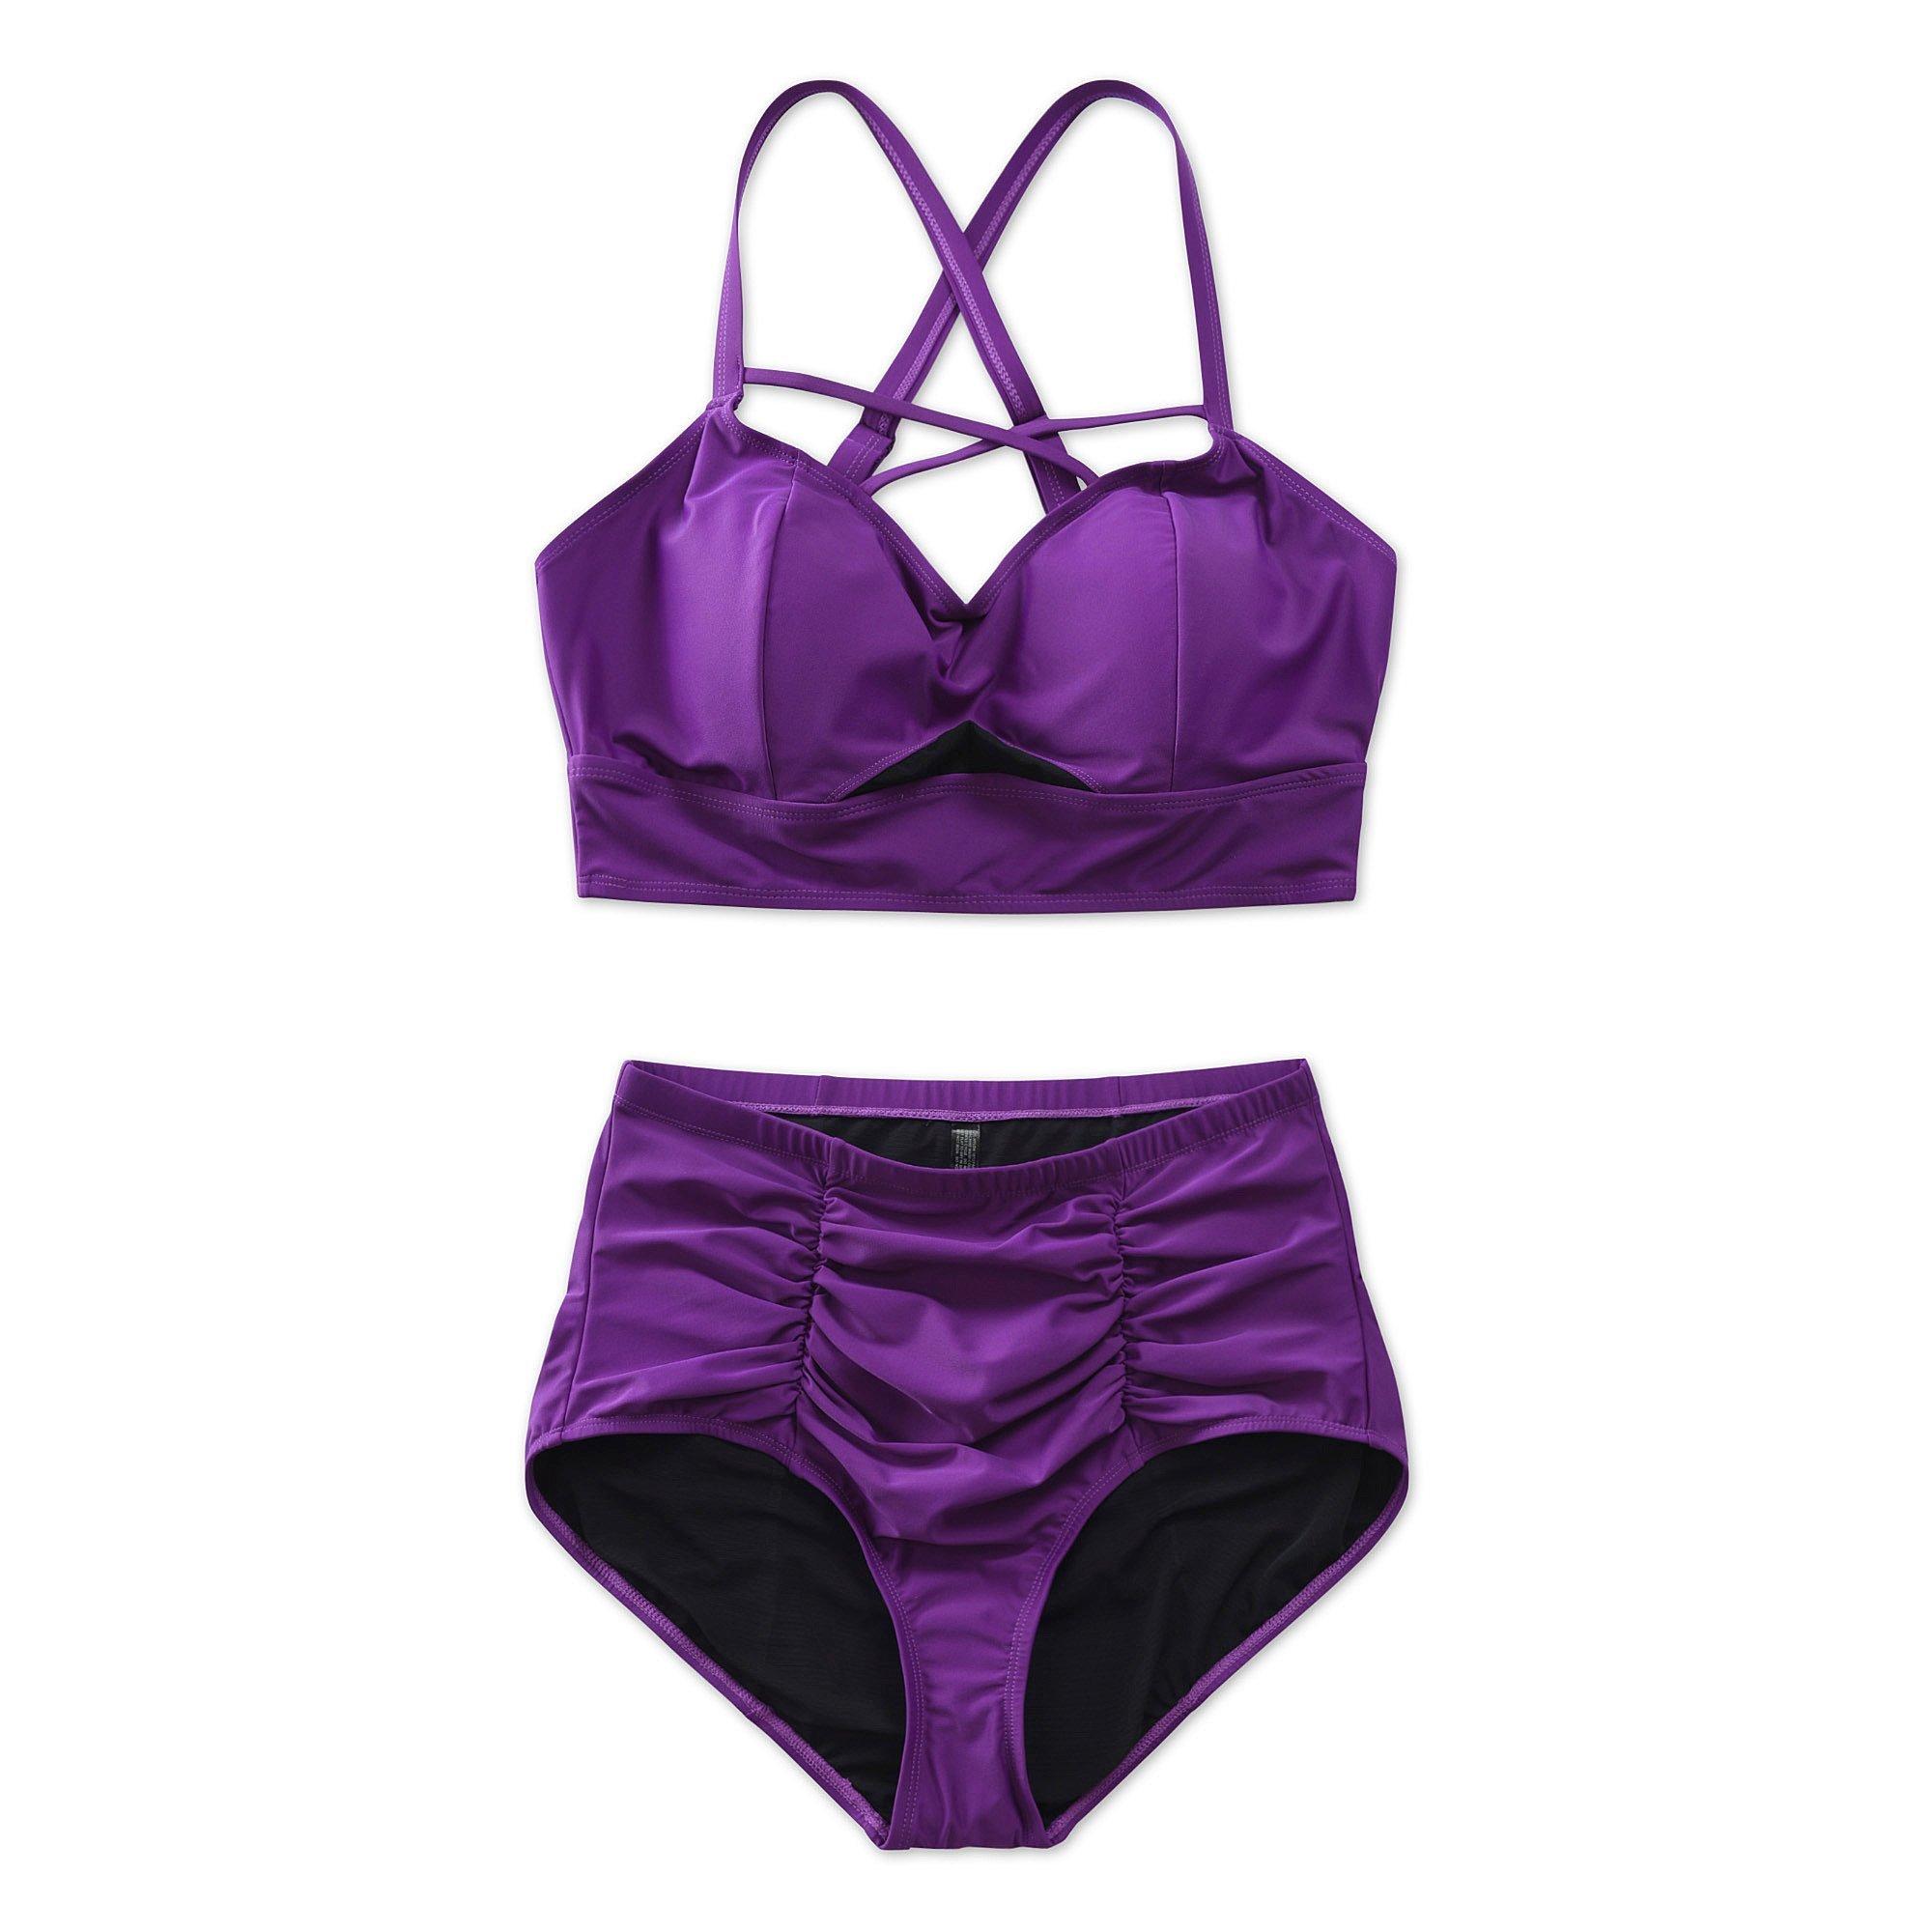 COLOCEAN Women Plus Size Swimwear Strappy High Waisted Two Piece Swimsuit Sexy Bikini Purple (3XL(US 22-24))